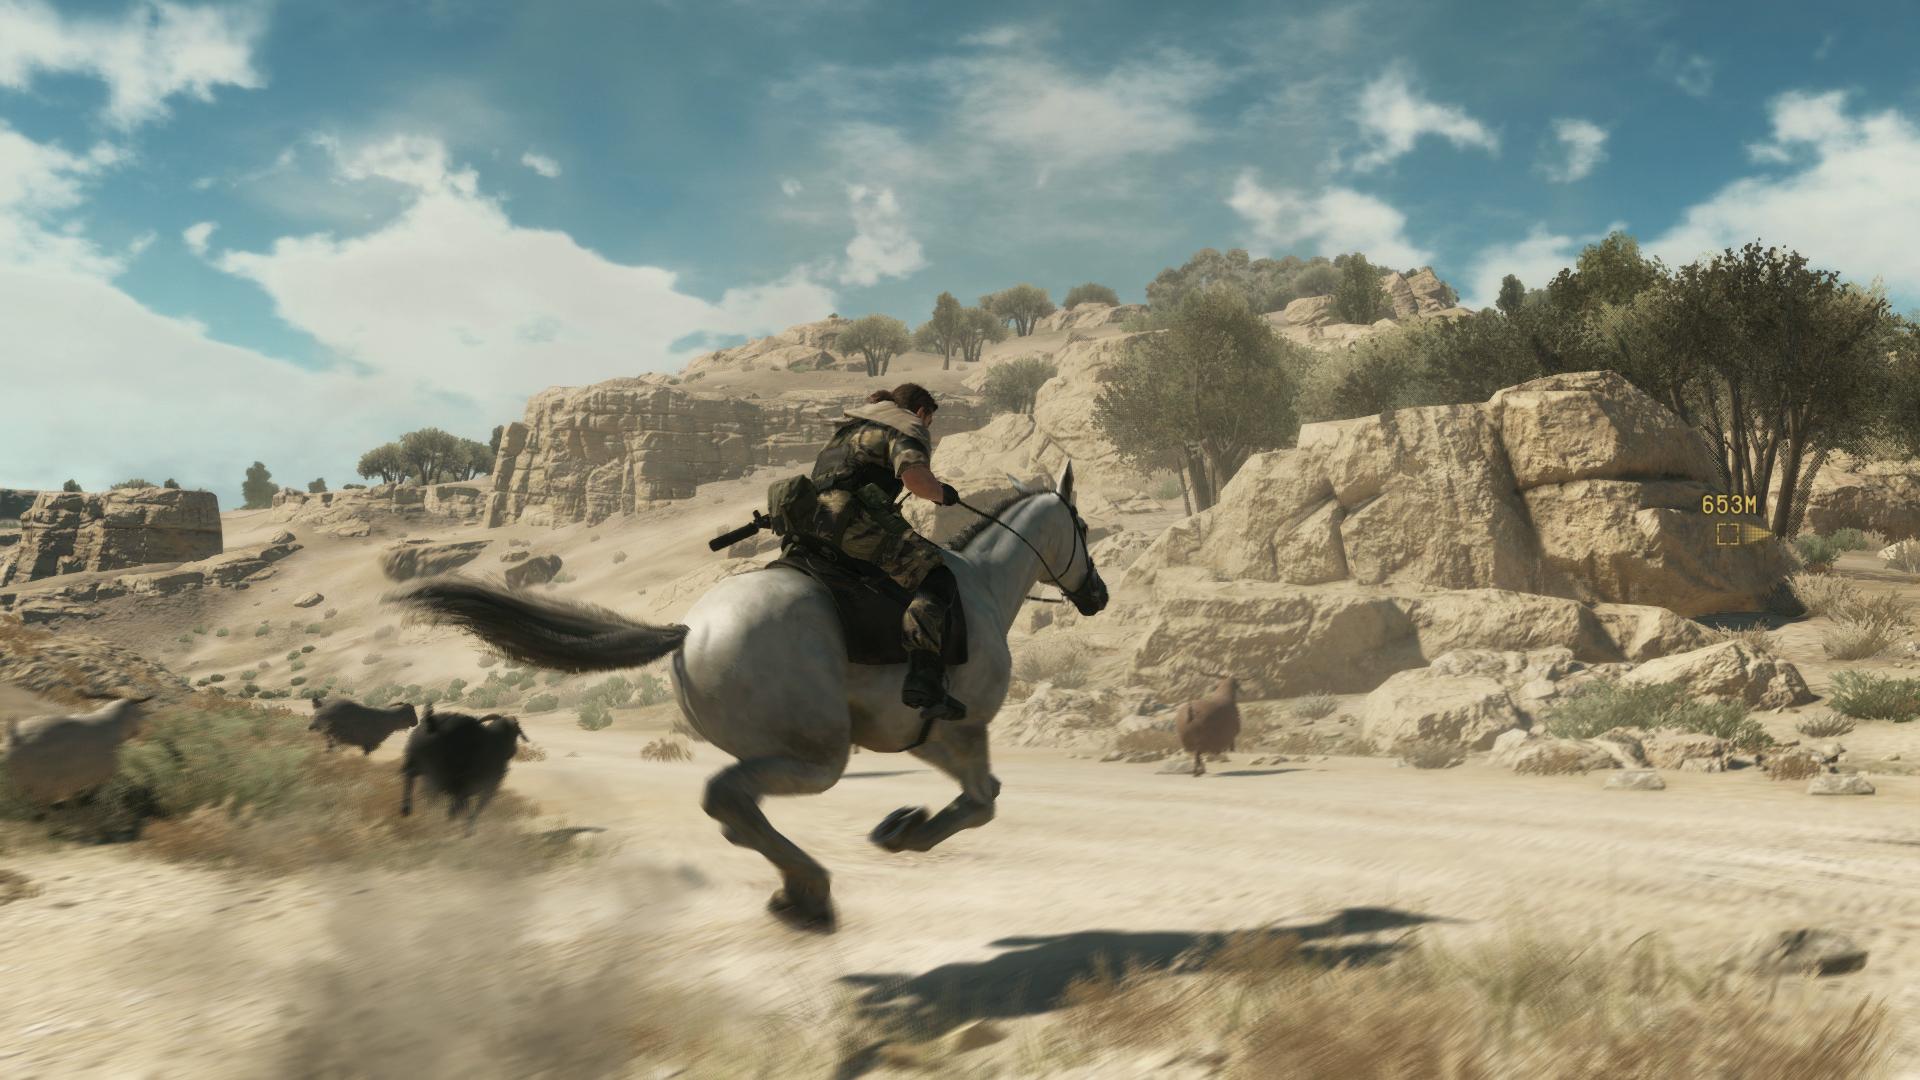 Metal Gear Solid V The Phantom Pain ESPAÑOL Descargar Full (CPY) + REPACK 5 DVD5 (JPW) 6